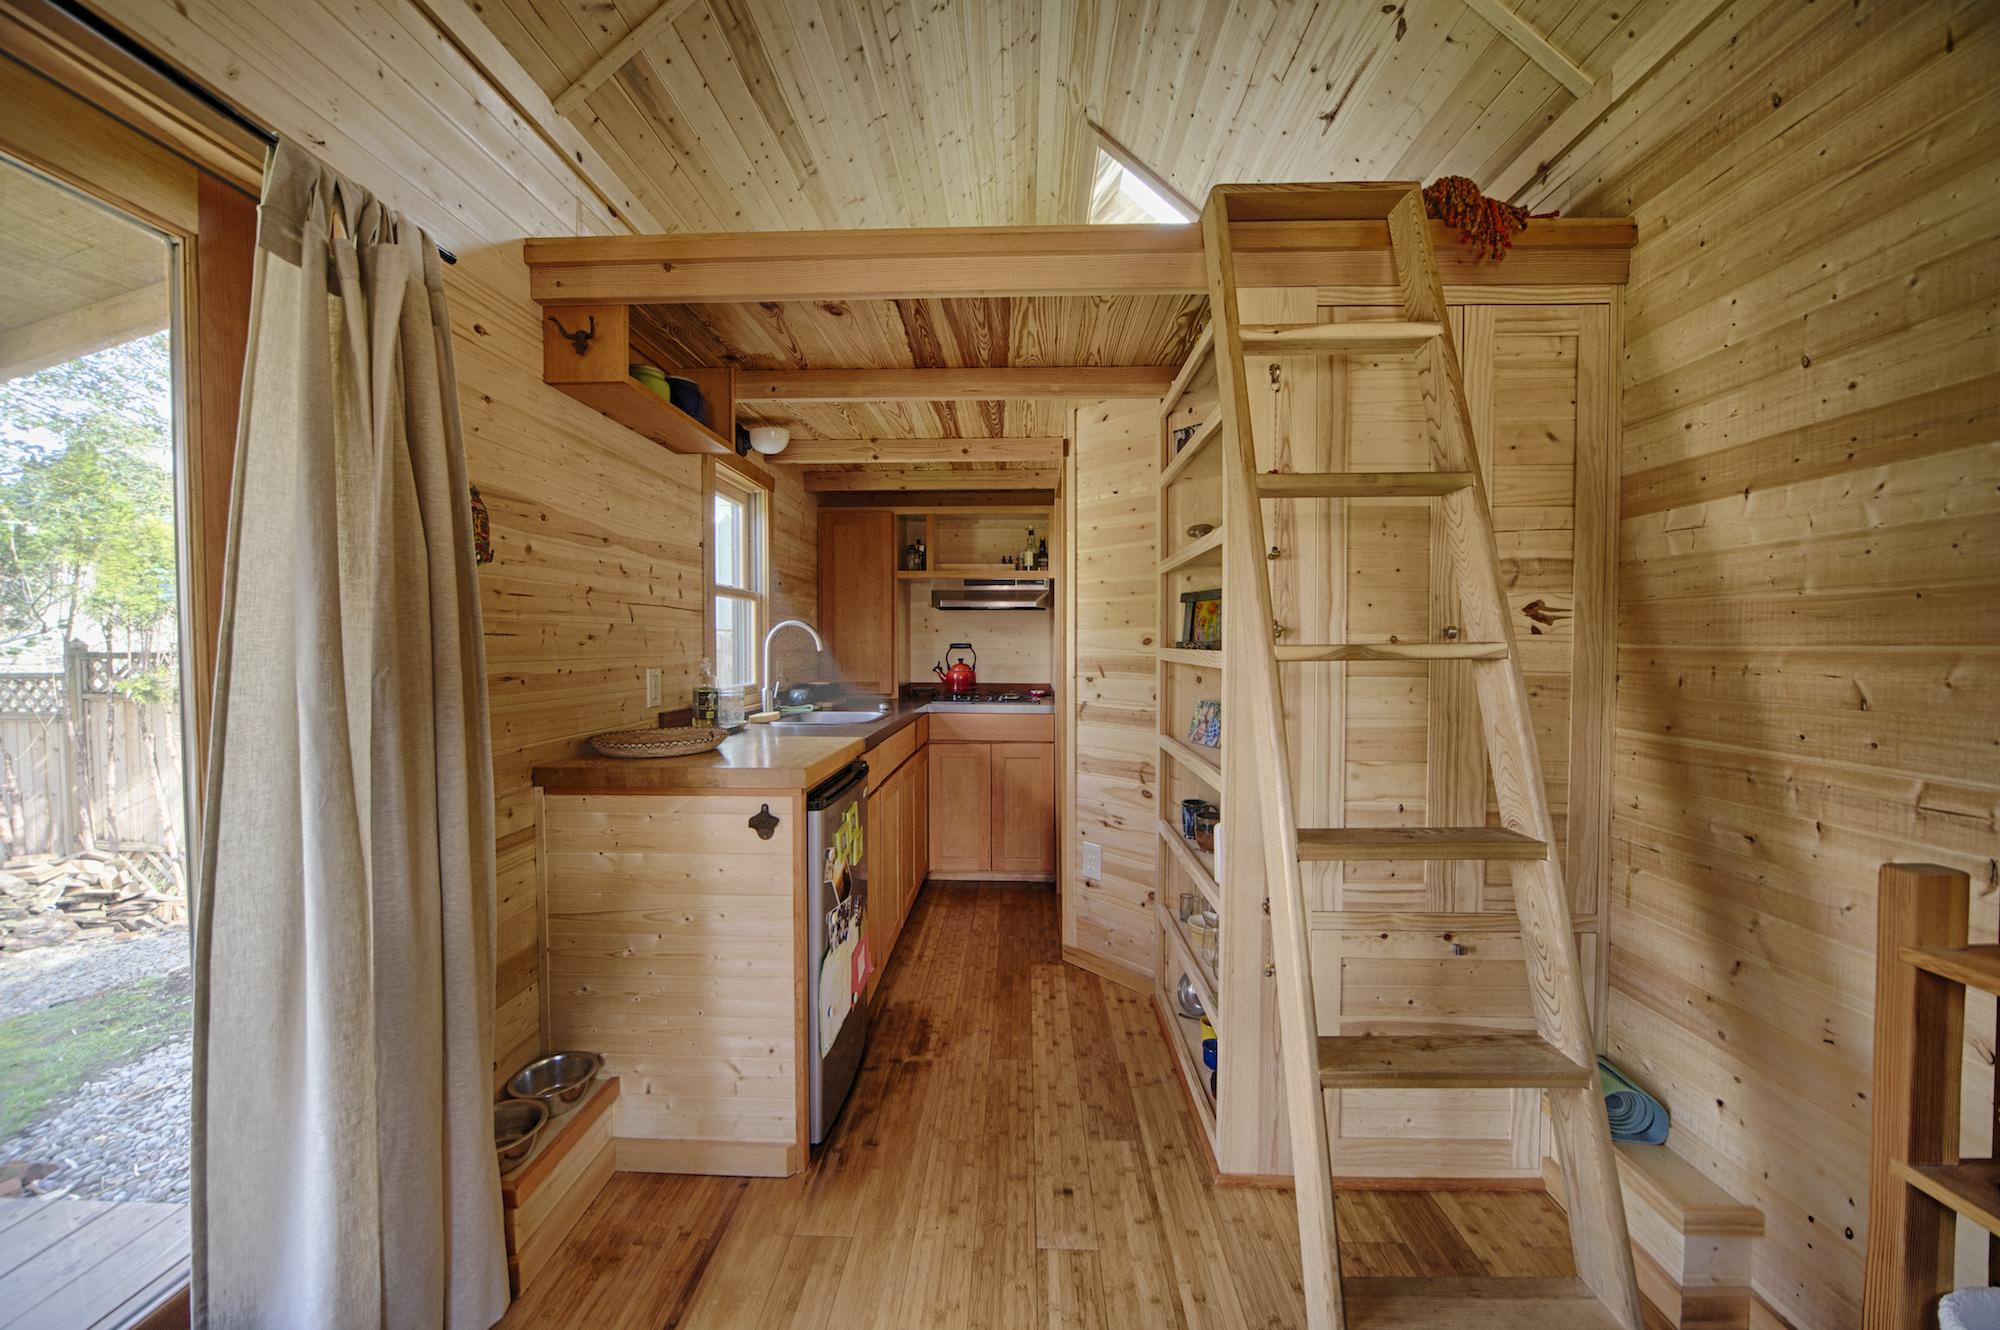 Inside Gina's Tiny House  -Photo by Christopher Tack